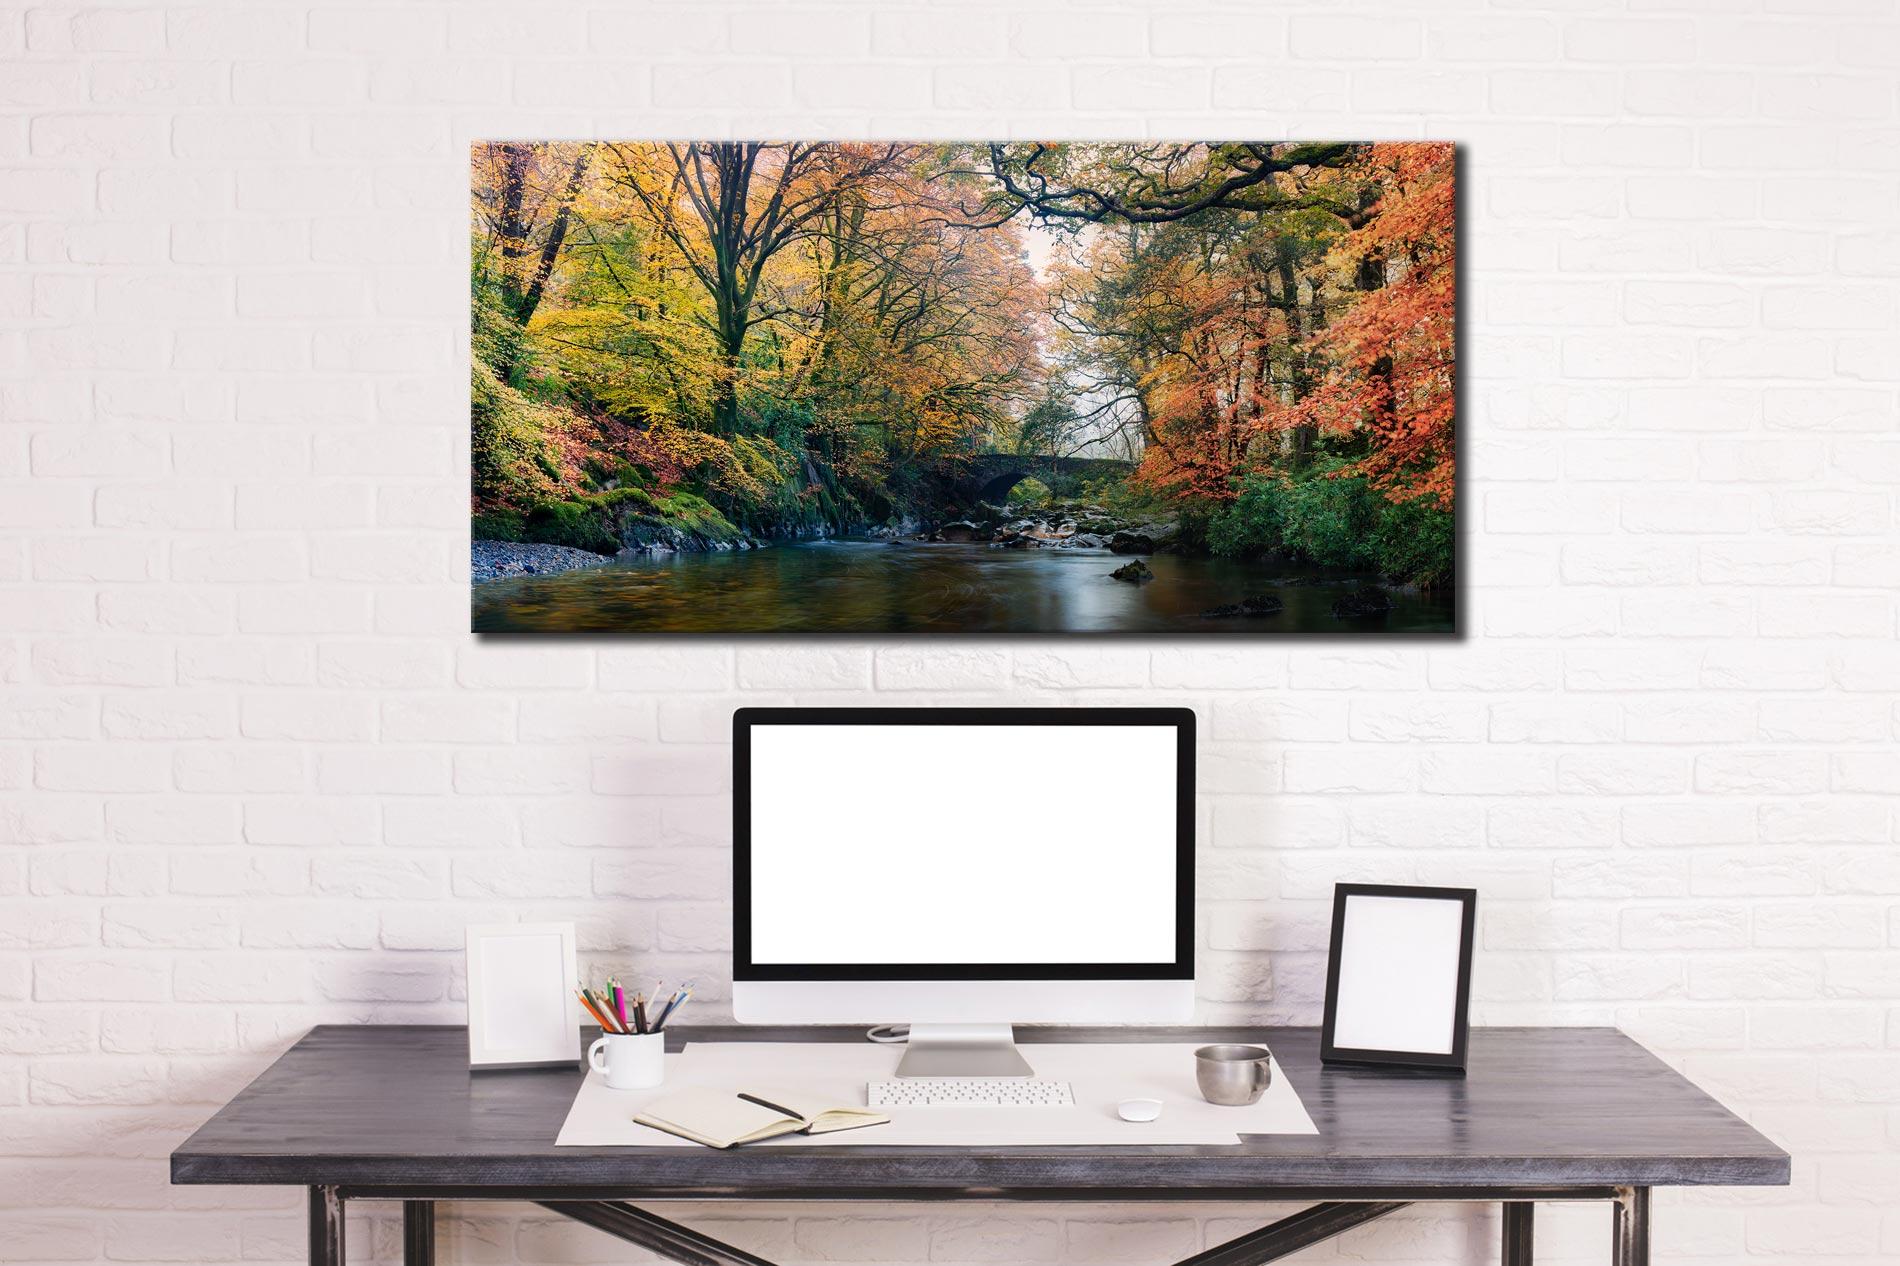 River Esk Bridge in Autumn - Canvas Print on Wall